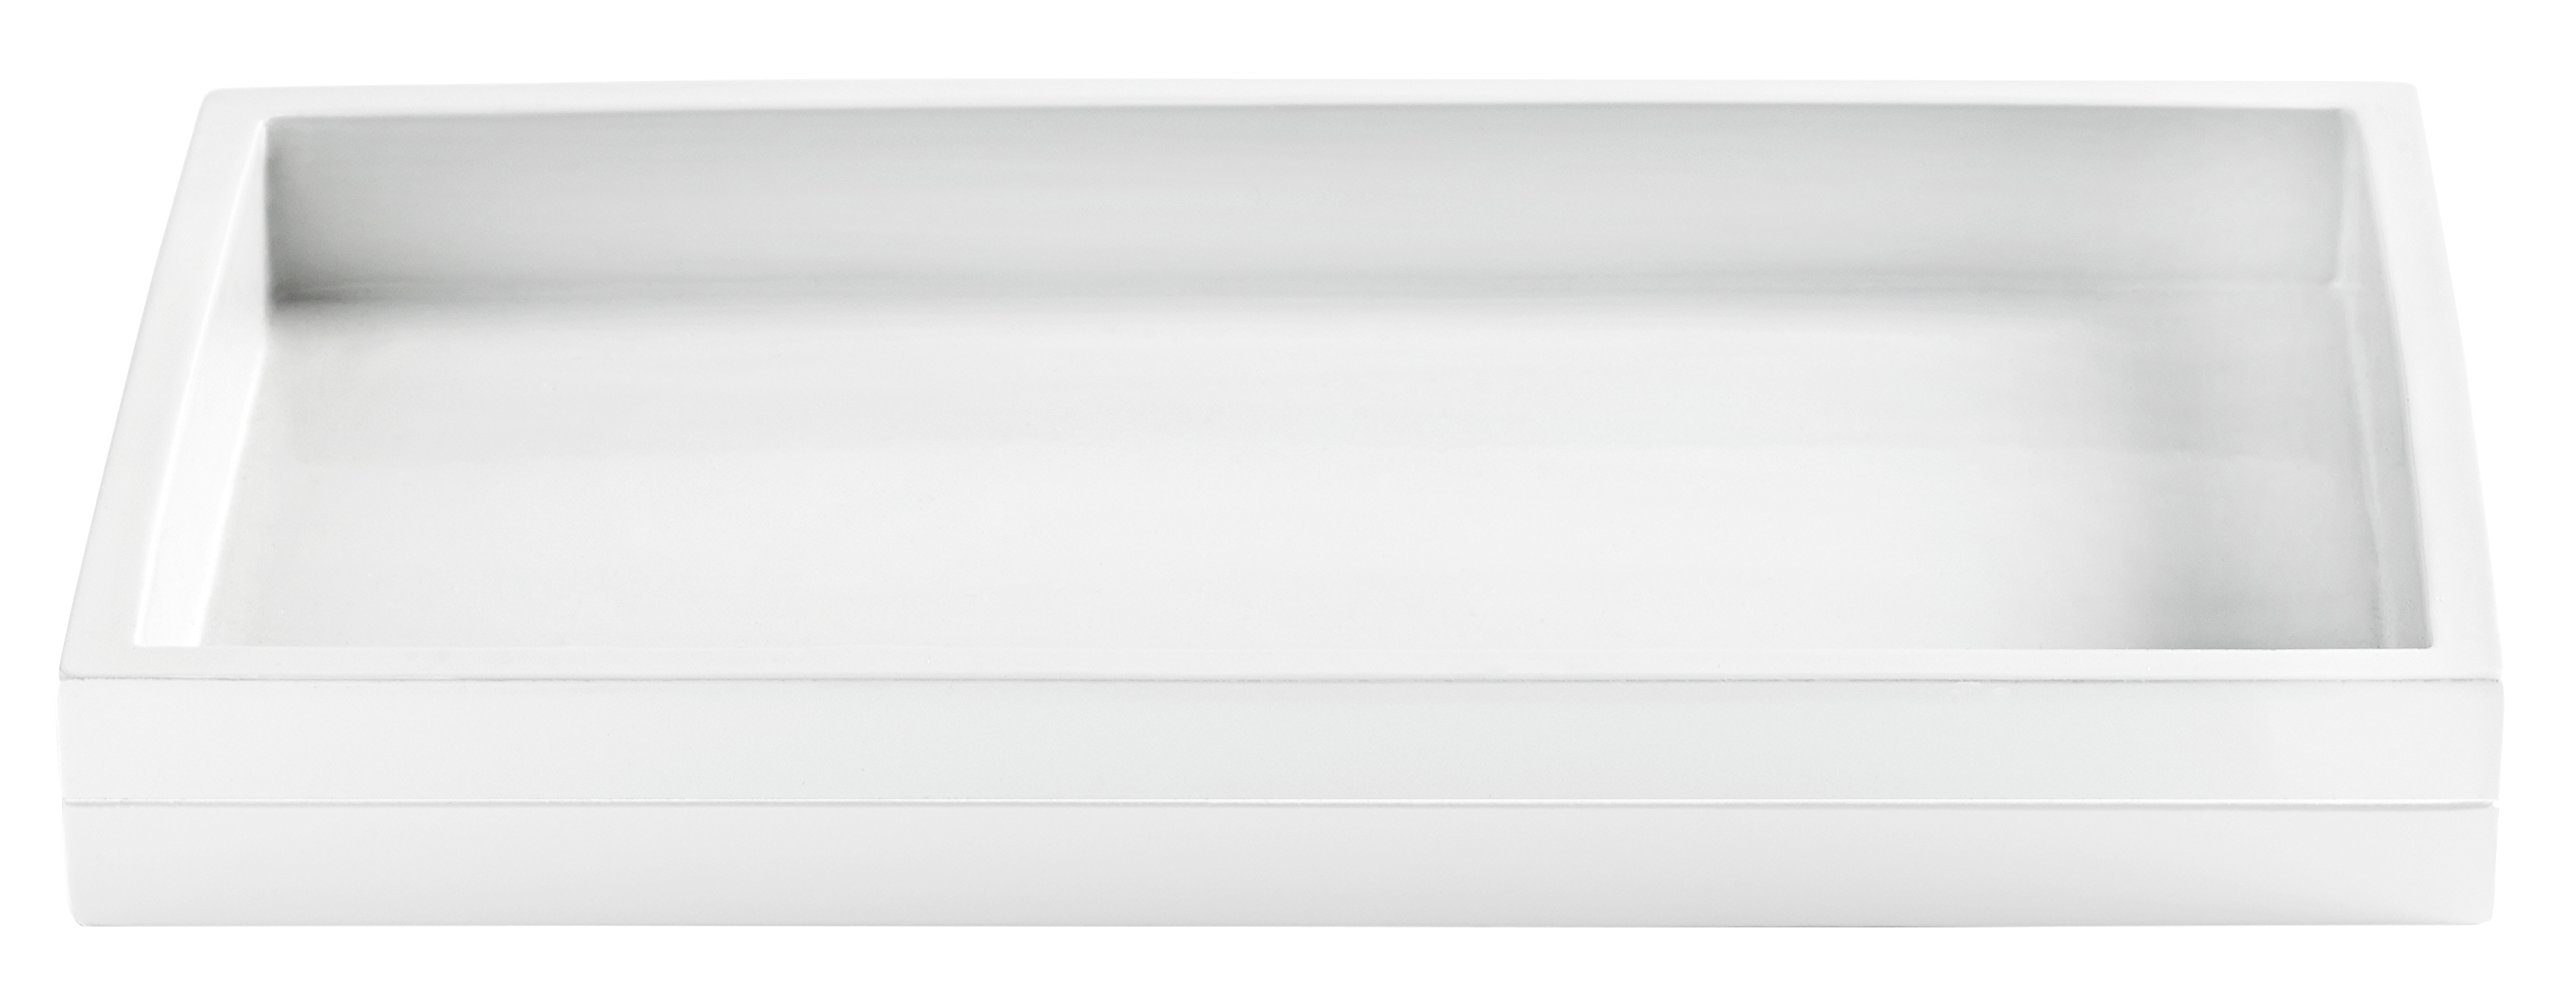 Kassatex Fine Linens Cabana Accessories Tray White